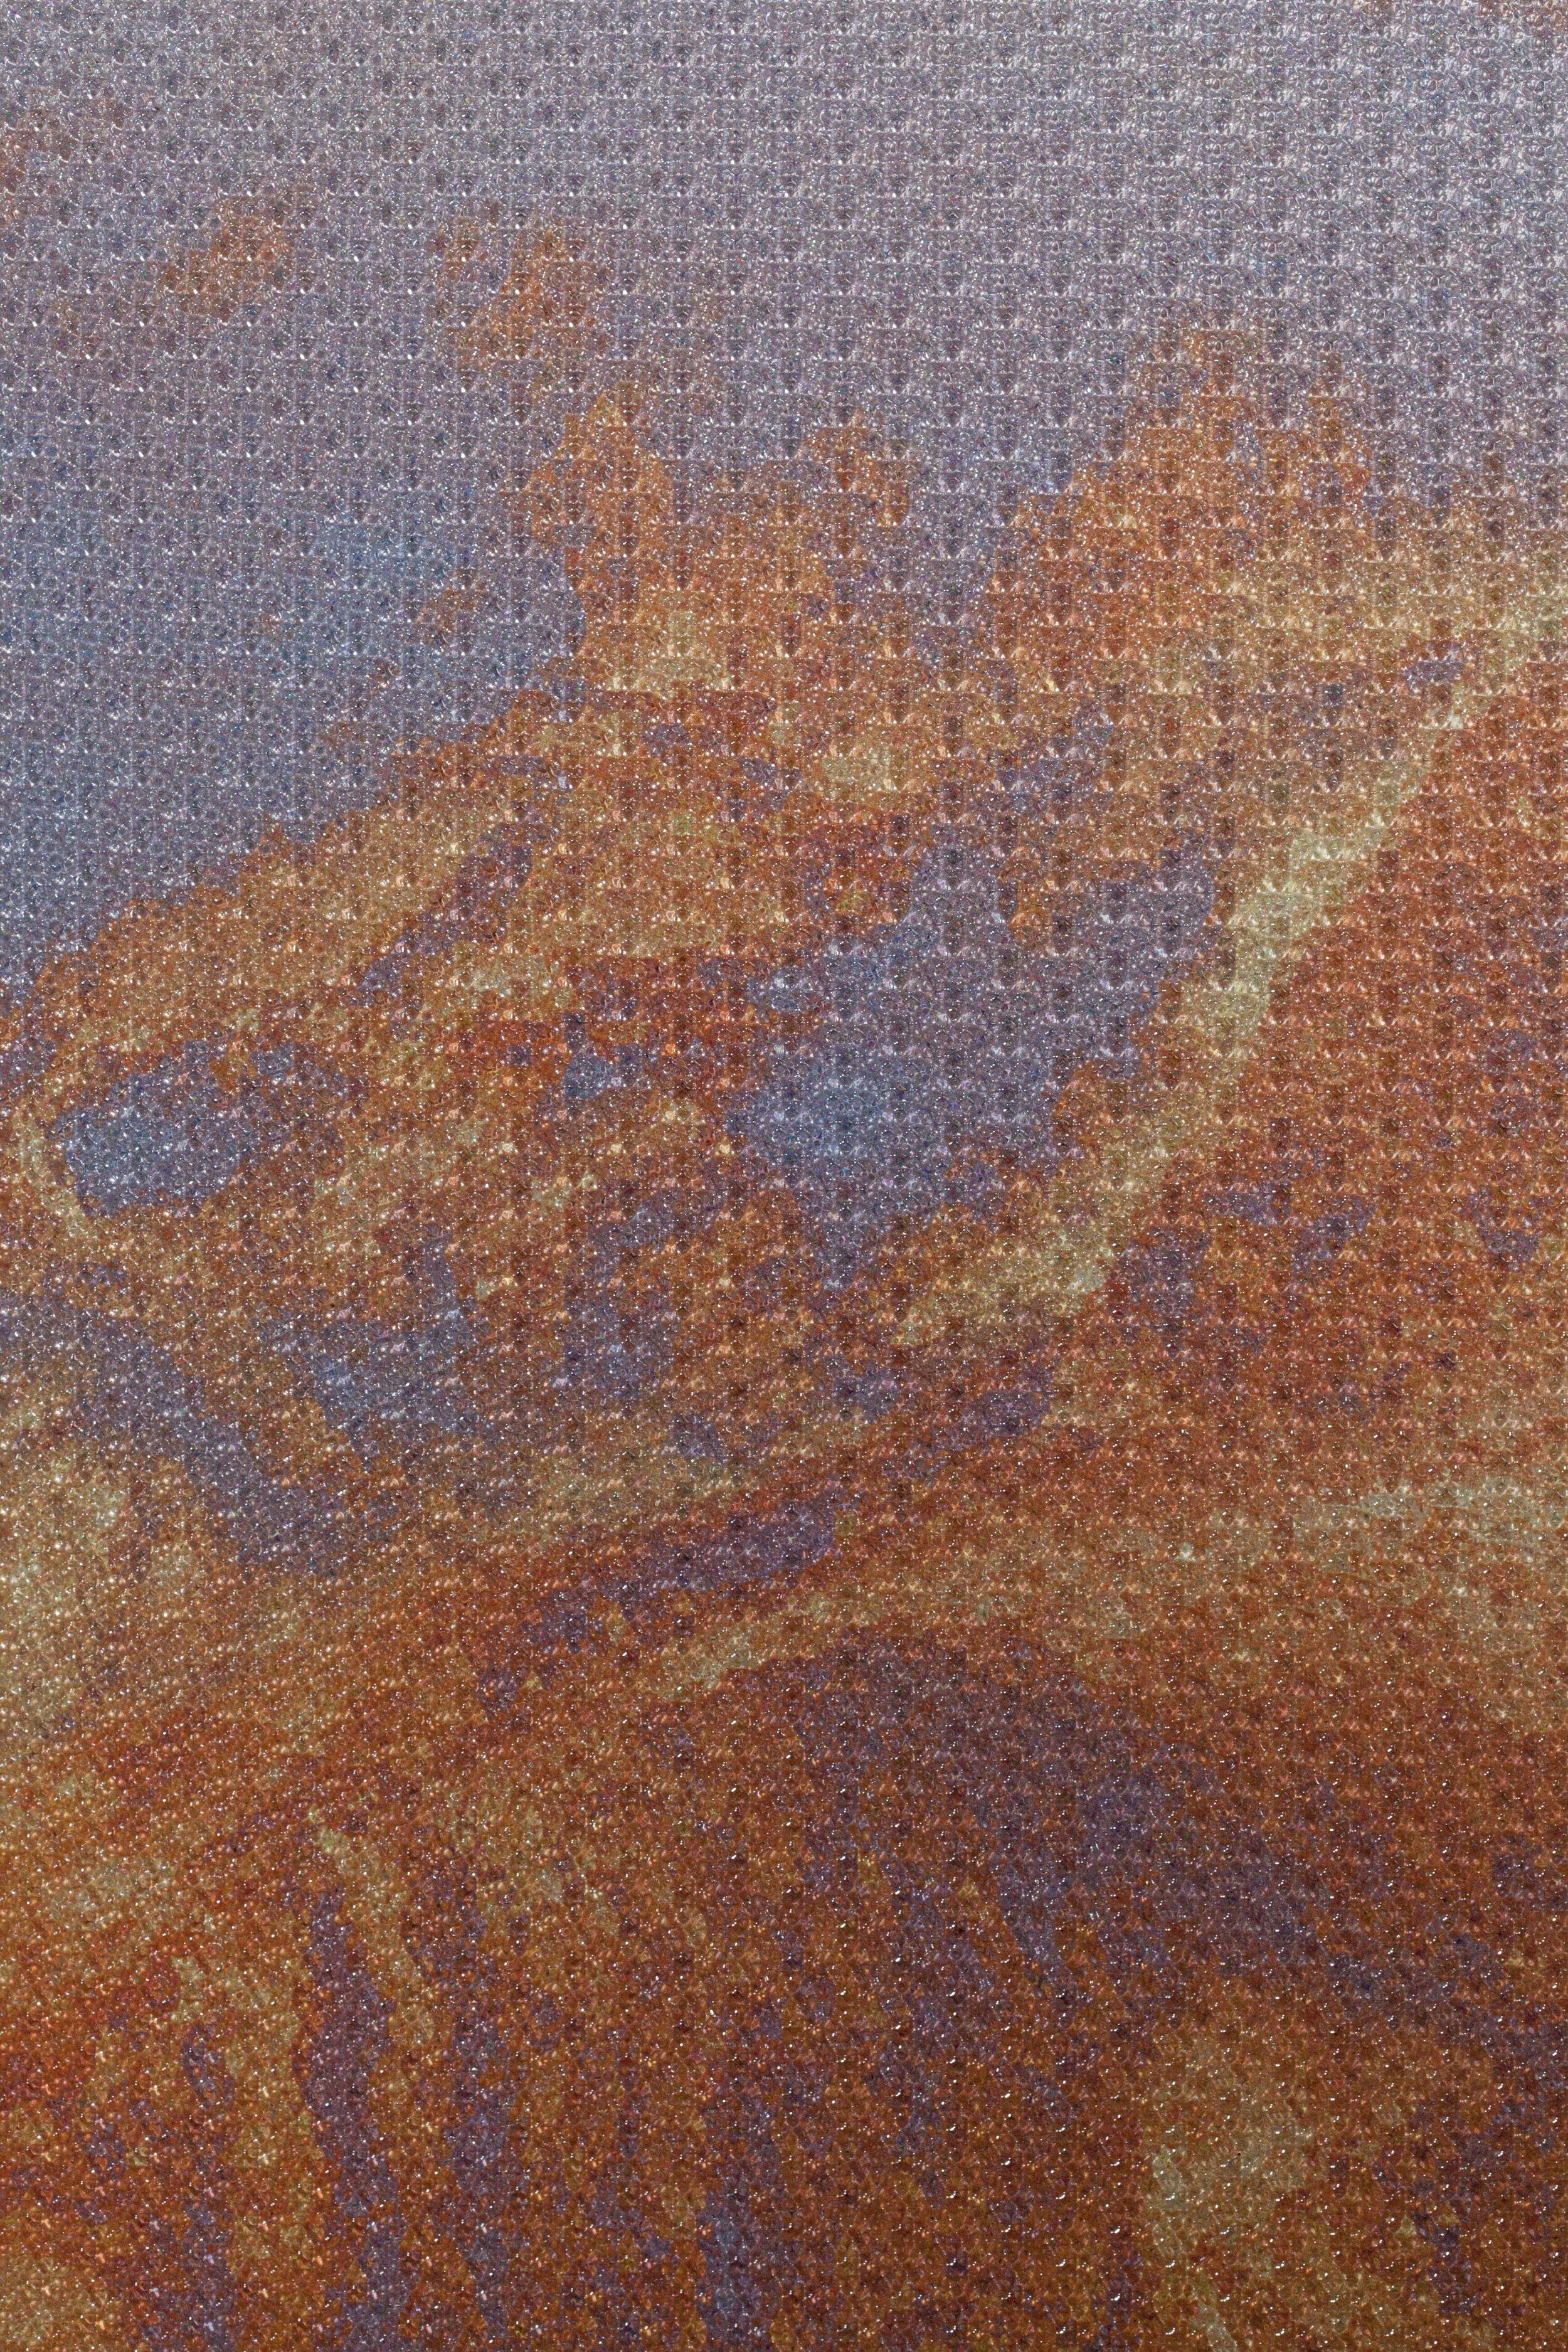 Beyond the Oecumene / Part IX,  2019 - Detail Aquarelle, wax pastels, UV-print on aluminium beneath marbled Plexiglas